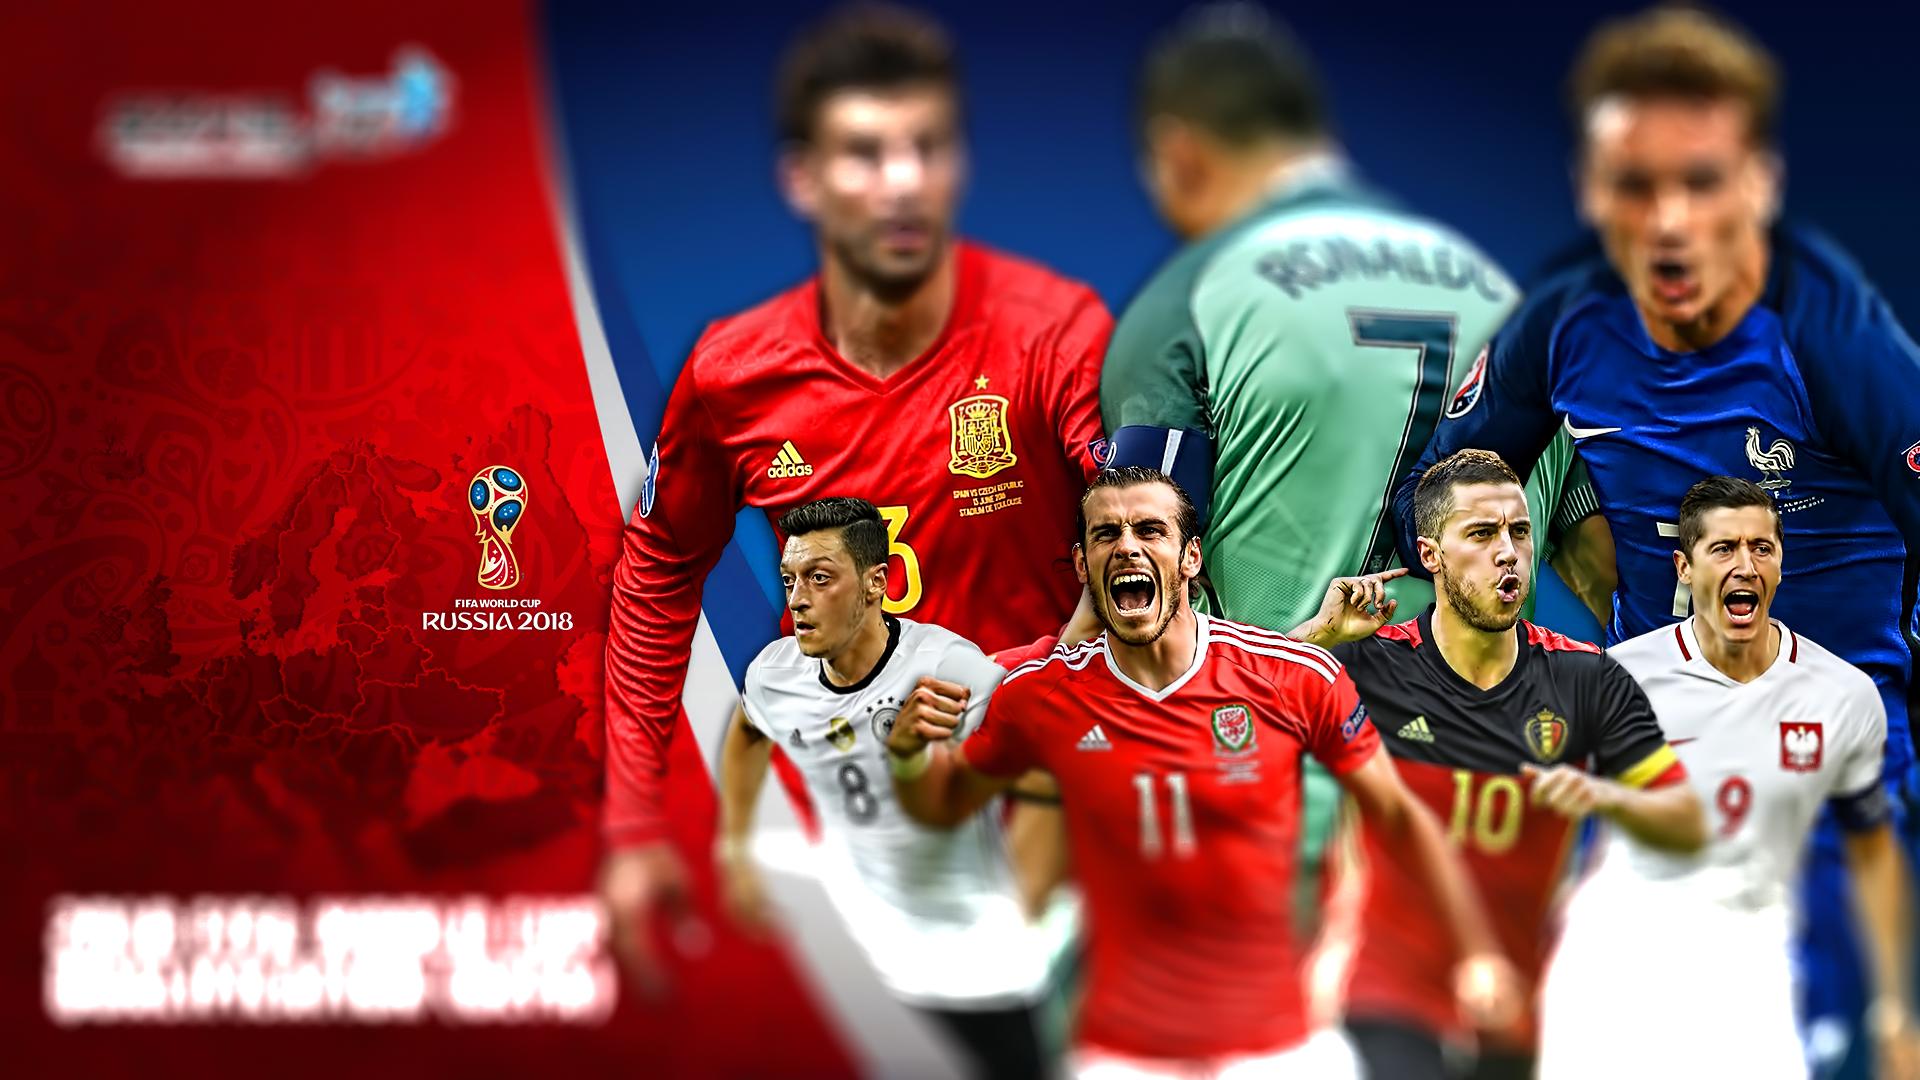 2018_fifa_world_cup_qualification_uefa_by_szwejzi-daggcwm.png